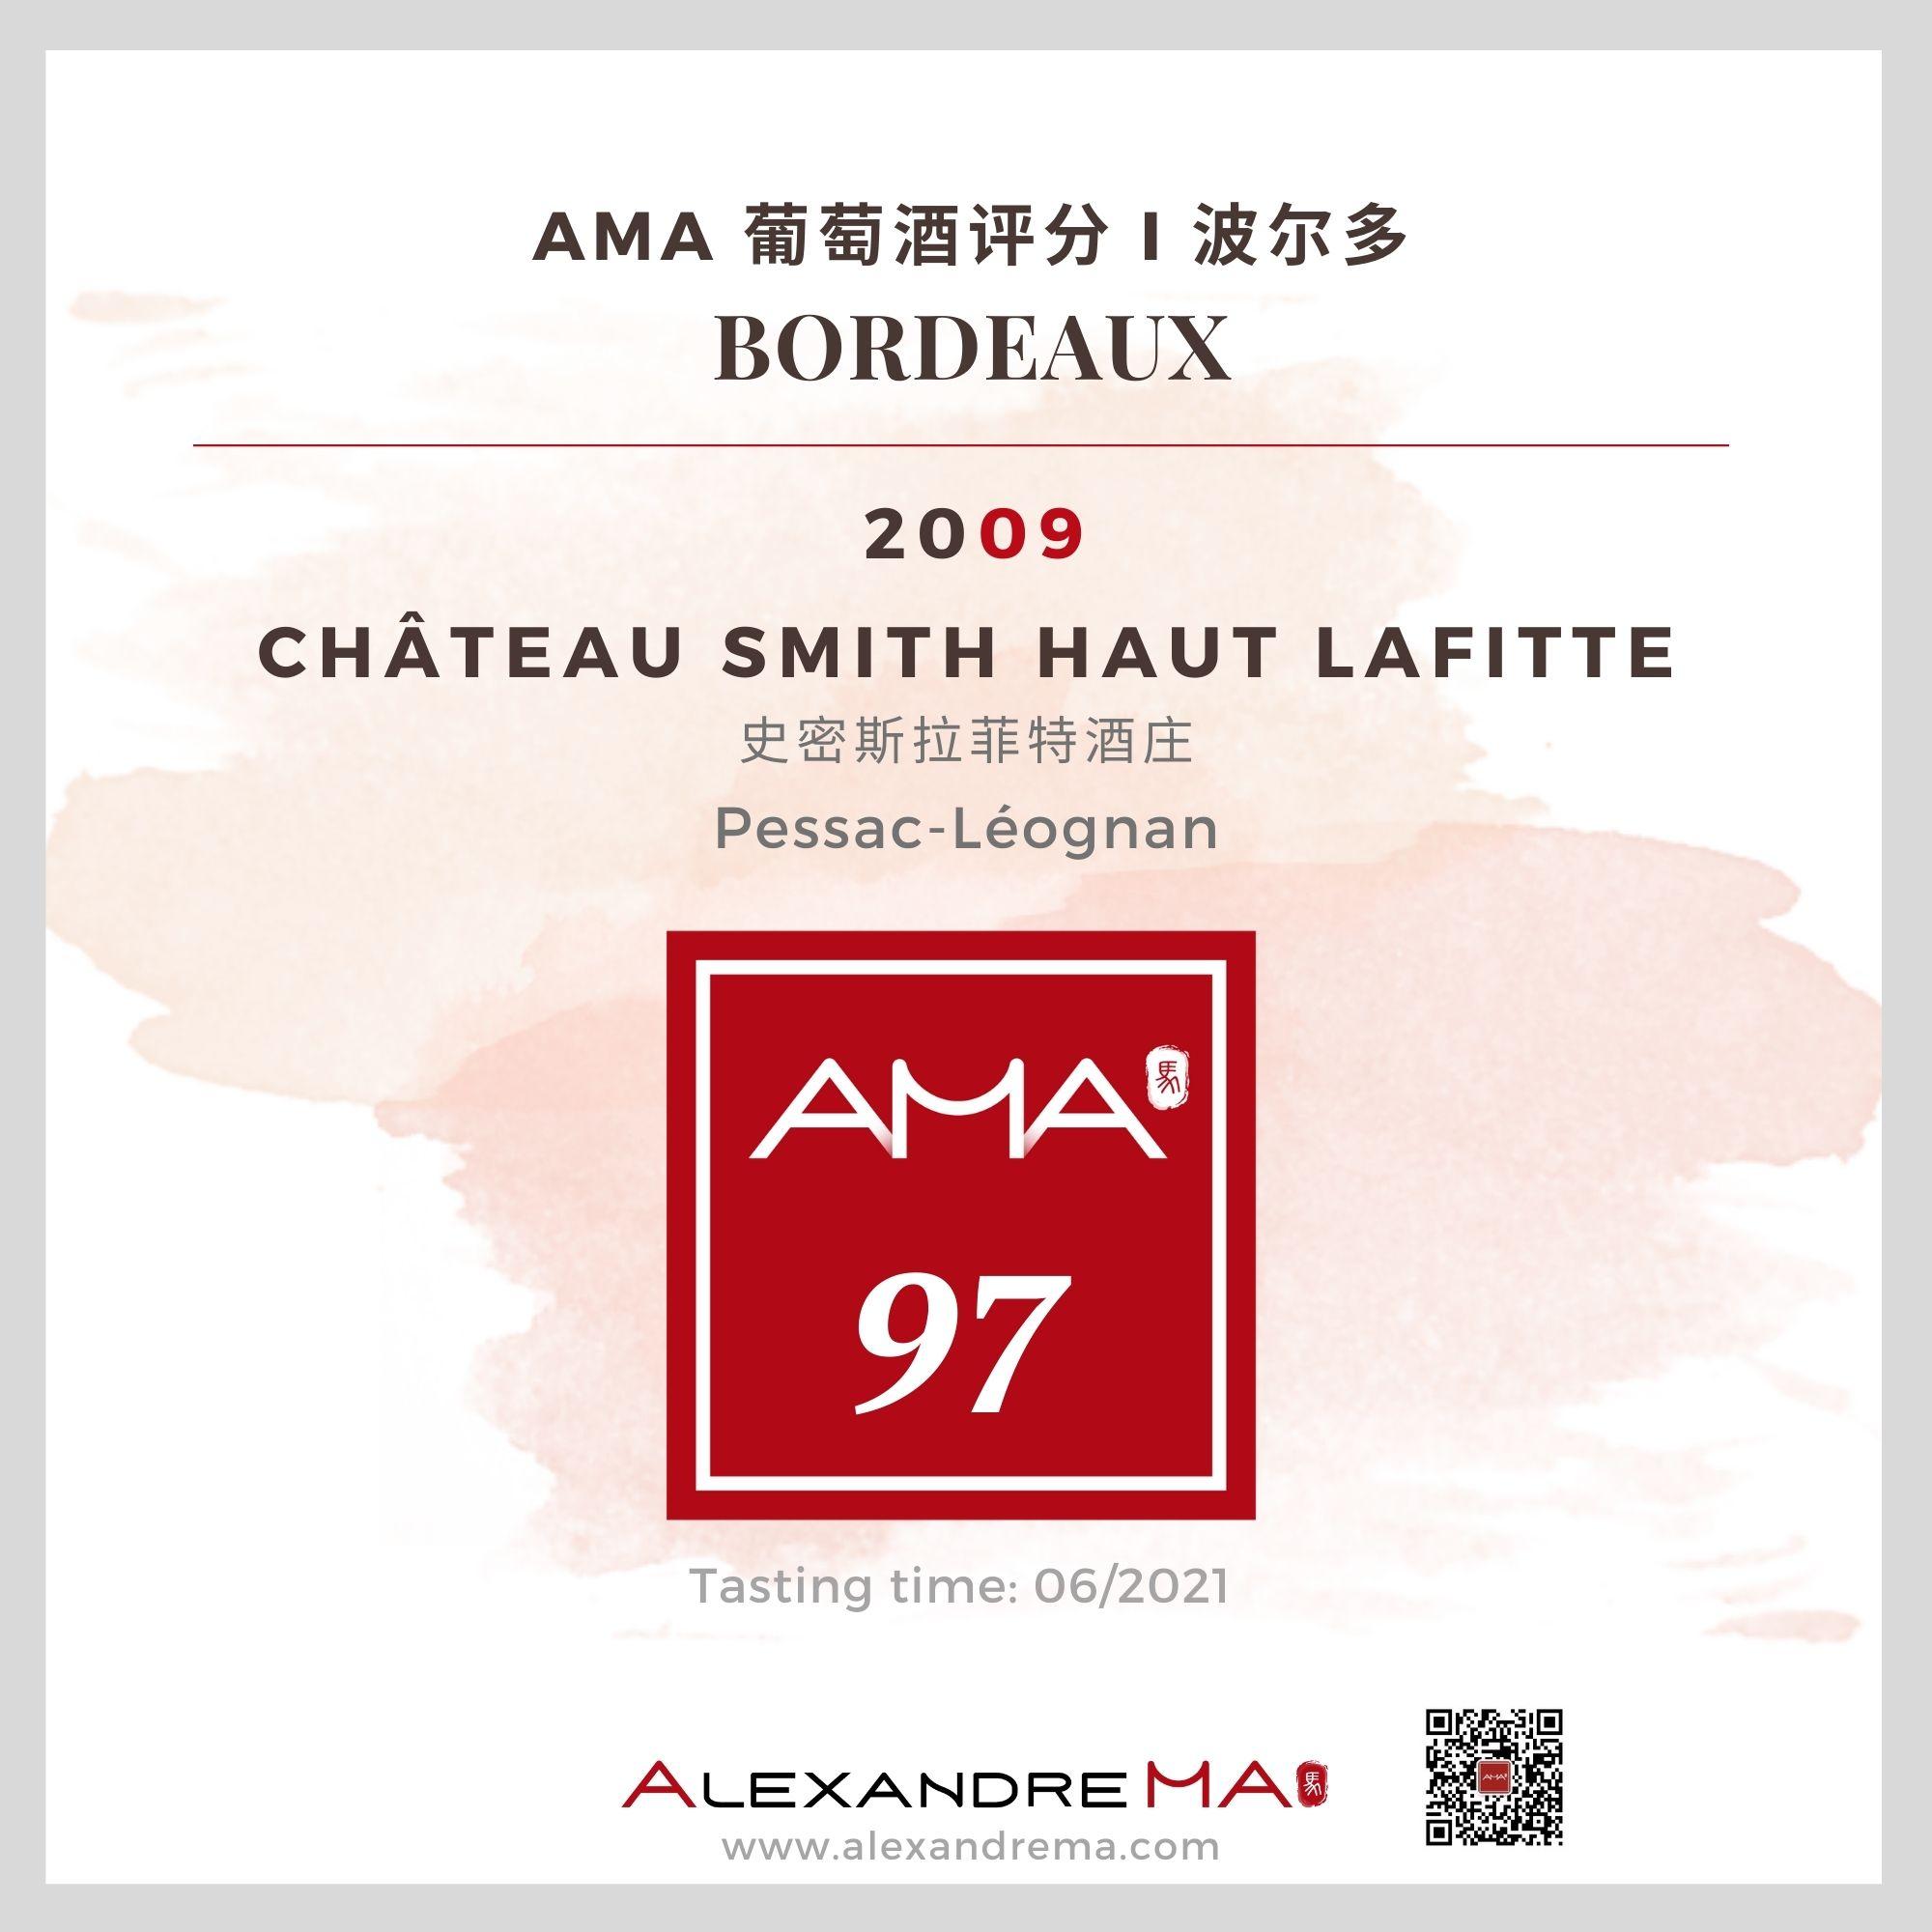 Château Smith Haut Lafitte 2009 史密斯拉菲特酒庄 - Alexandre Ma